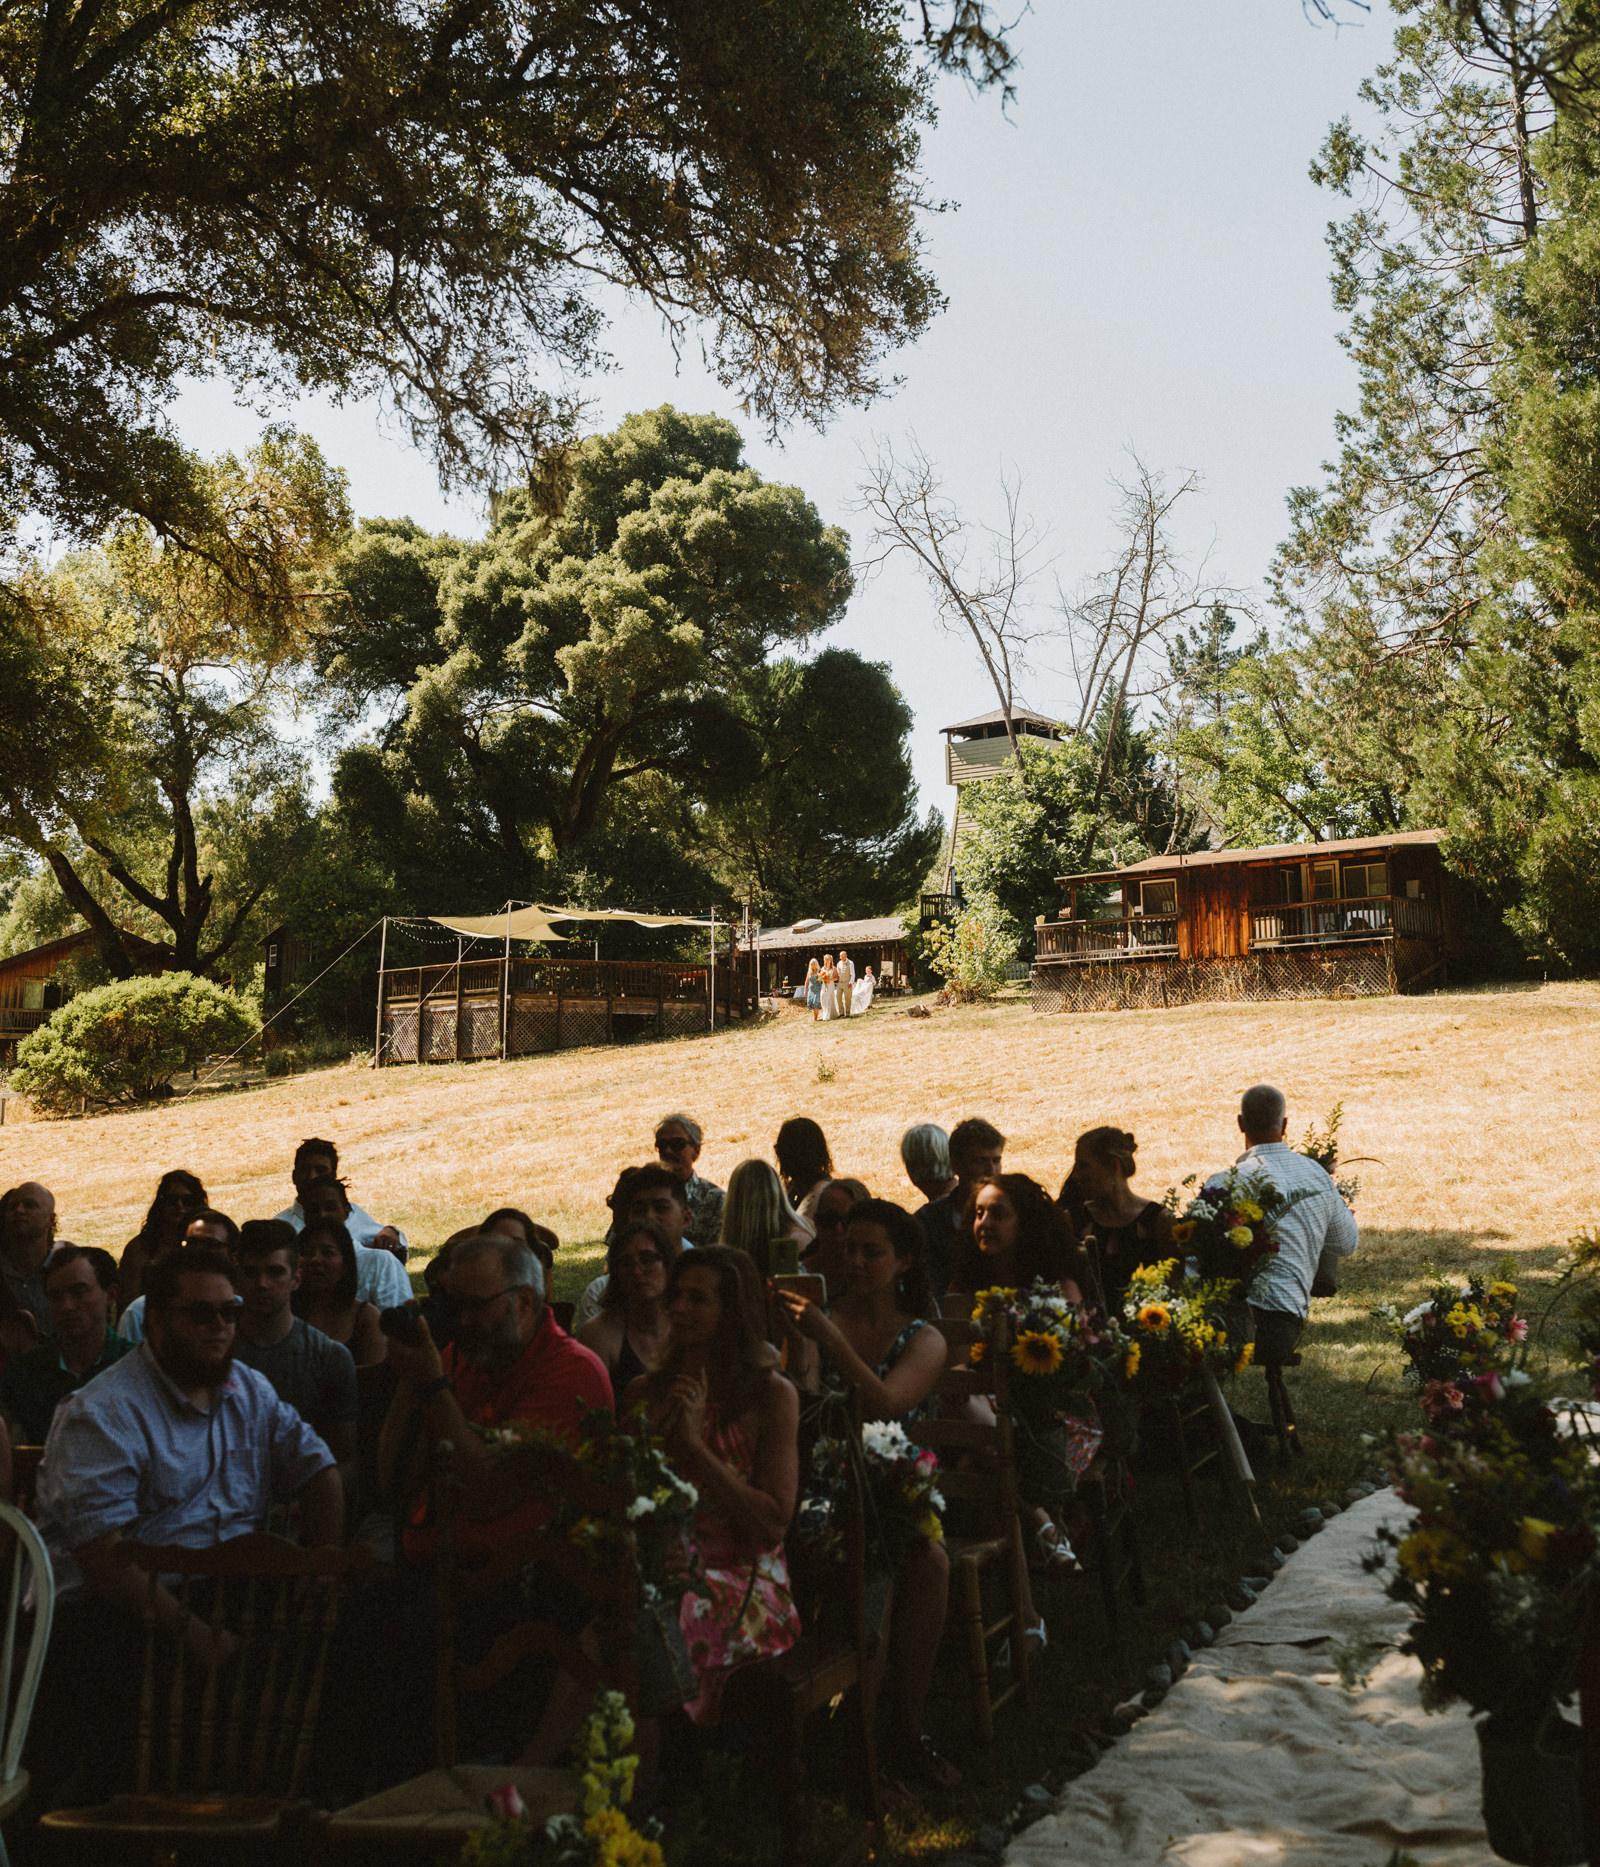 rivers-bend-retreat-wedding-017 RIVER'S BEND RETREAT WEDDING